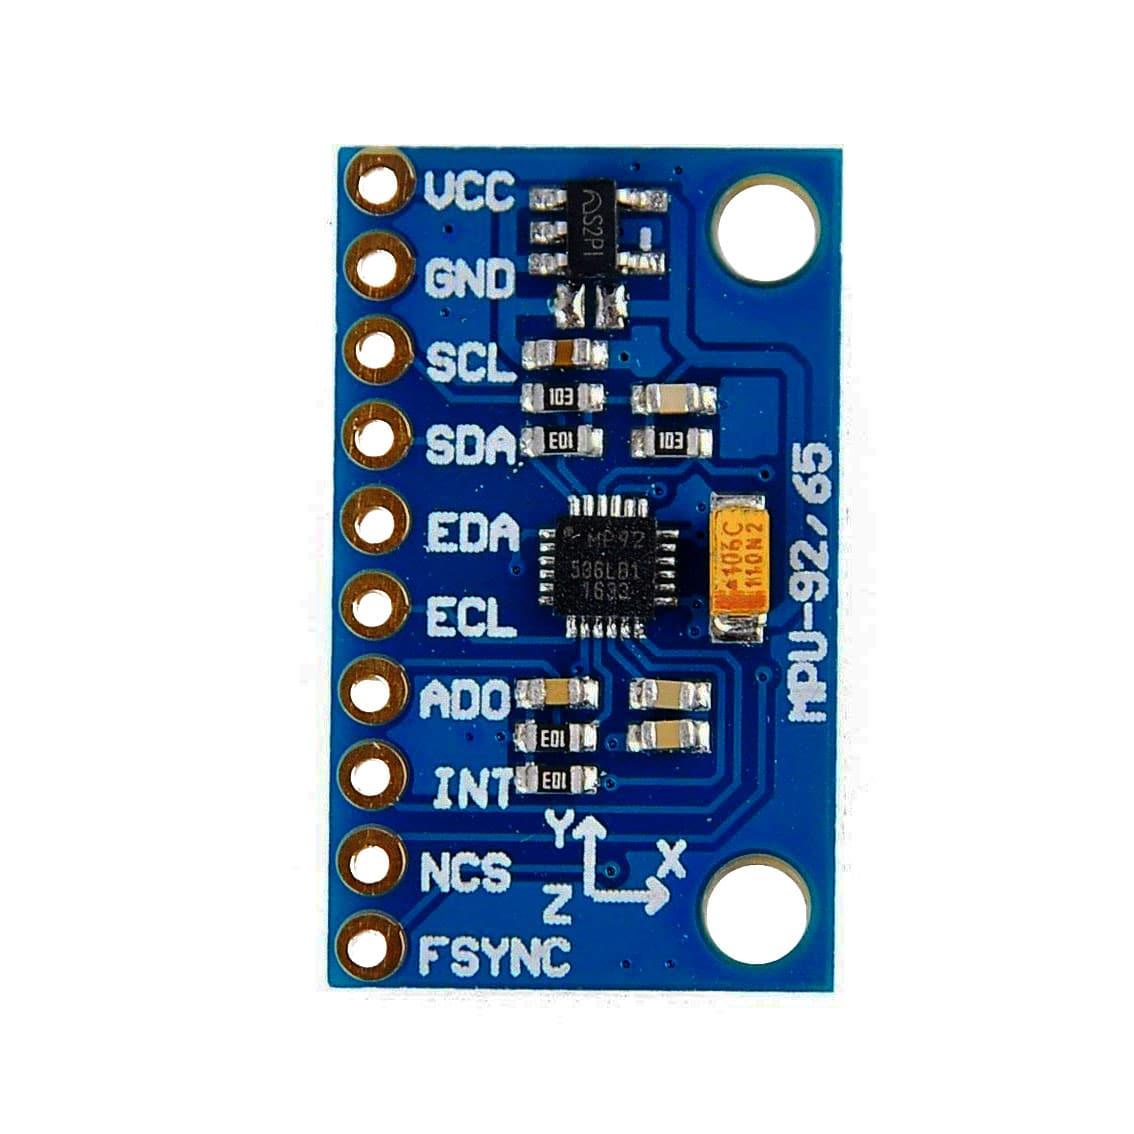 MPU9250 9-Axis Motion Sensor Module - Accelerometer, Gyroscope, Compass,  Motion - Phipps Electronics